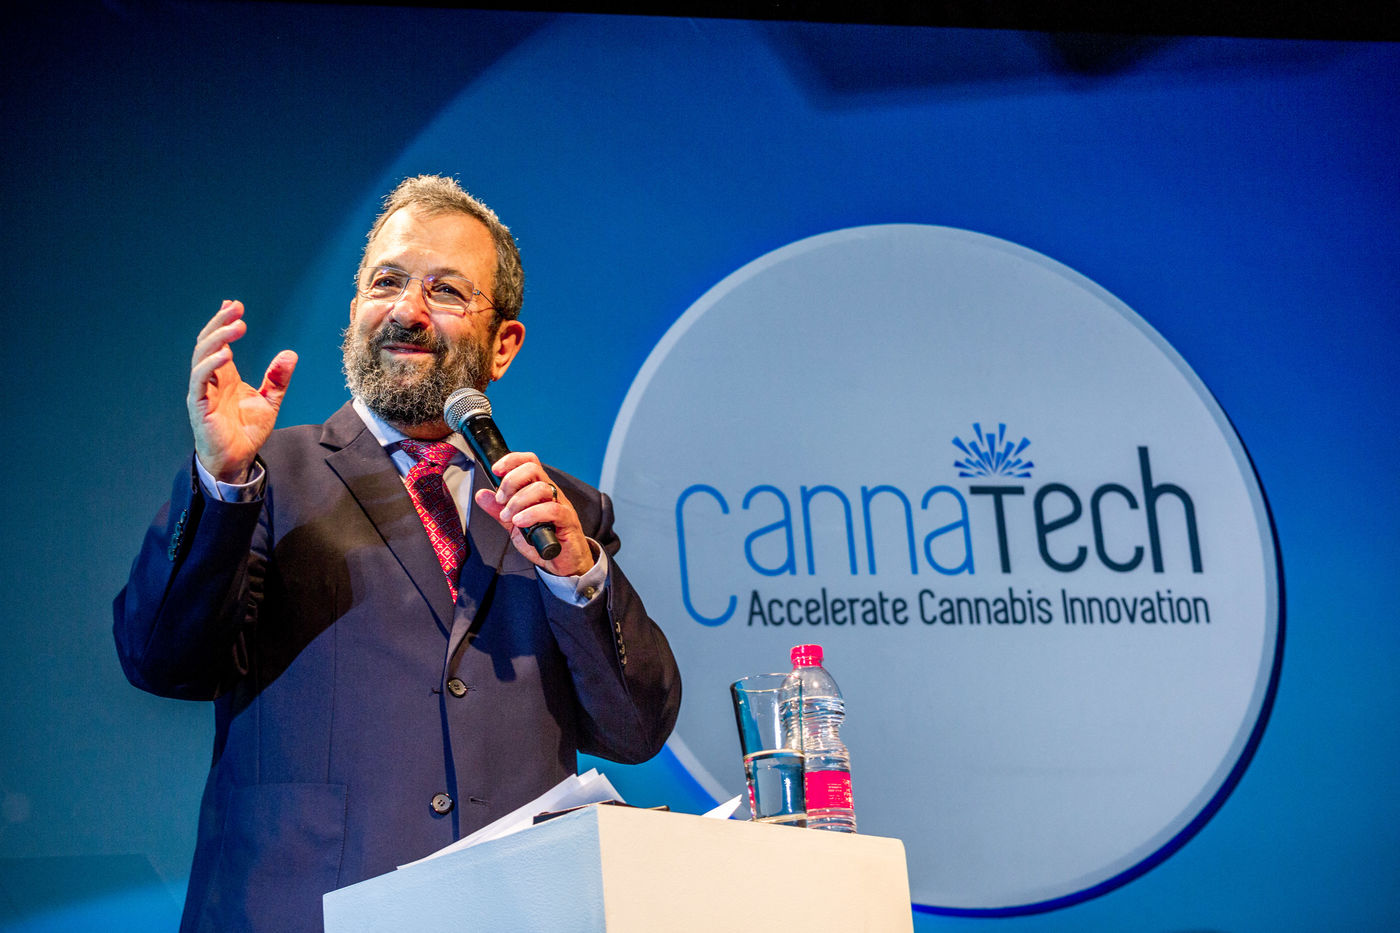 L'ancien premier ministre Ehud Barak lors du salon Cannatech 2019 (avril 2019, Tel-Aviv, Israël). Photo : Hanslucas.com